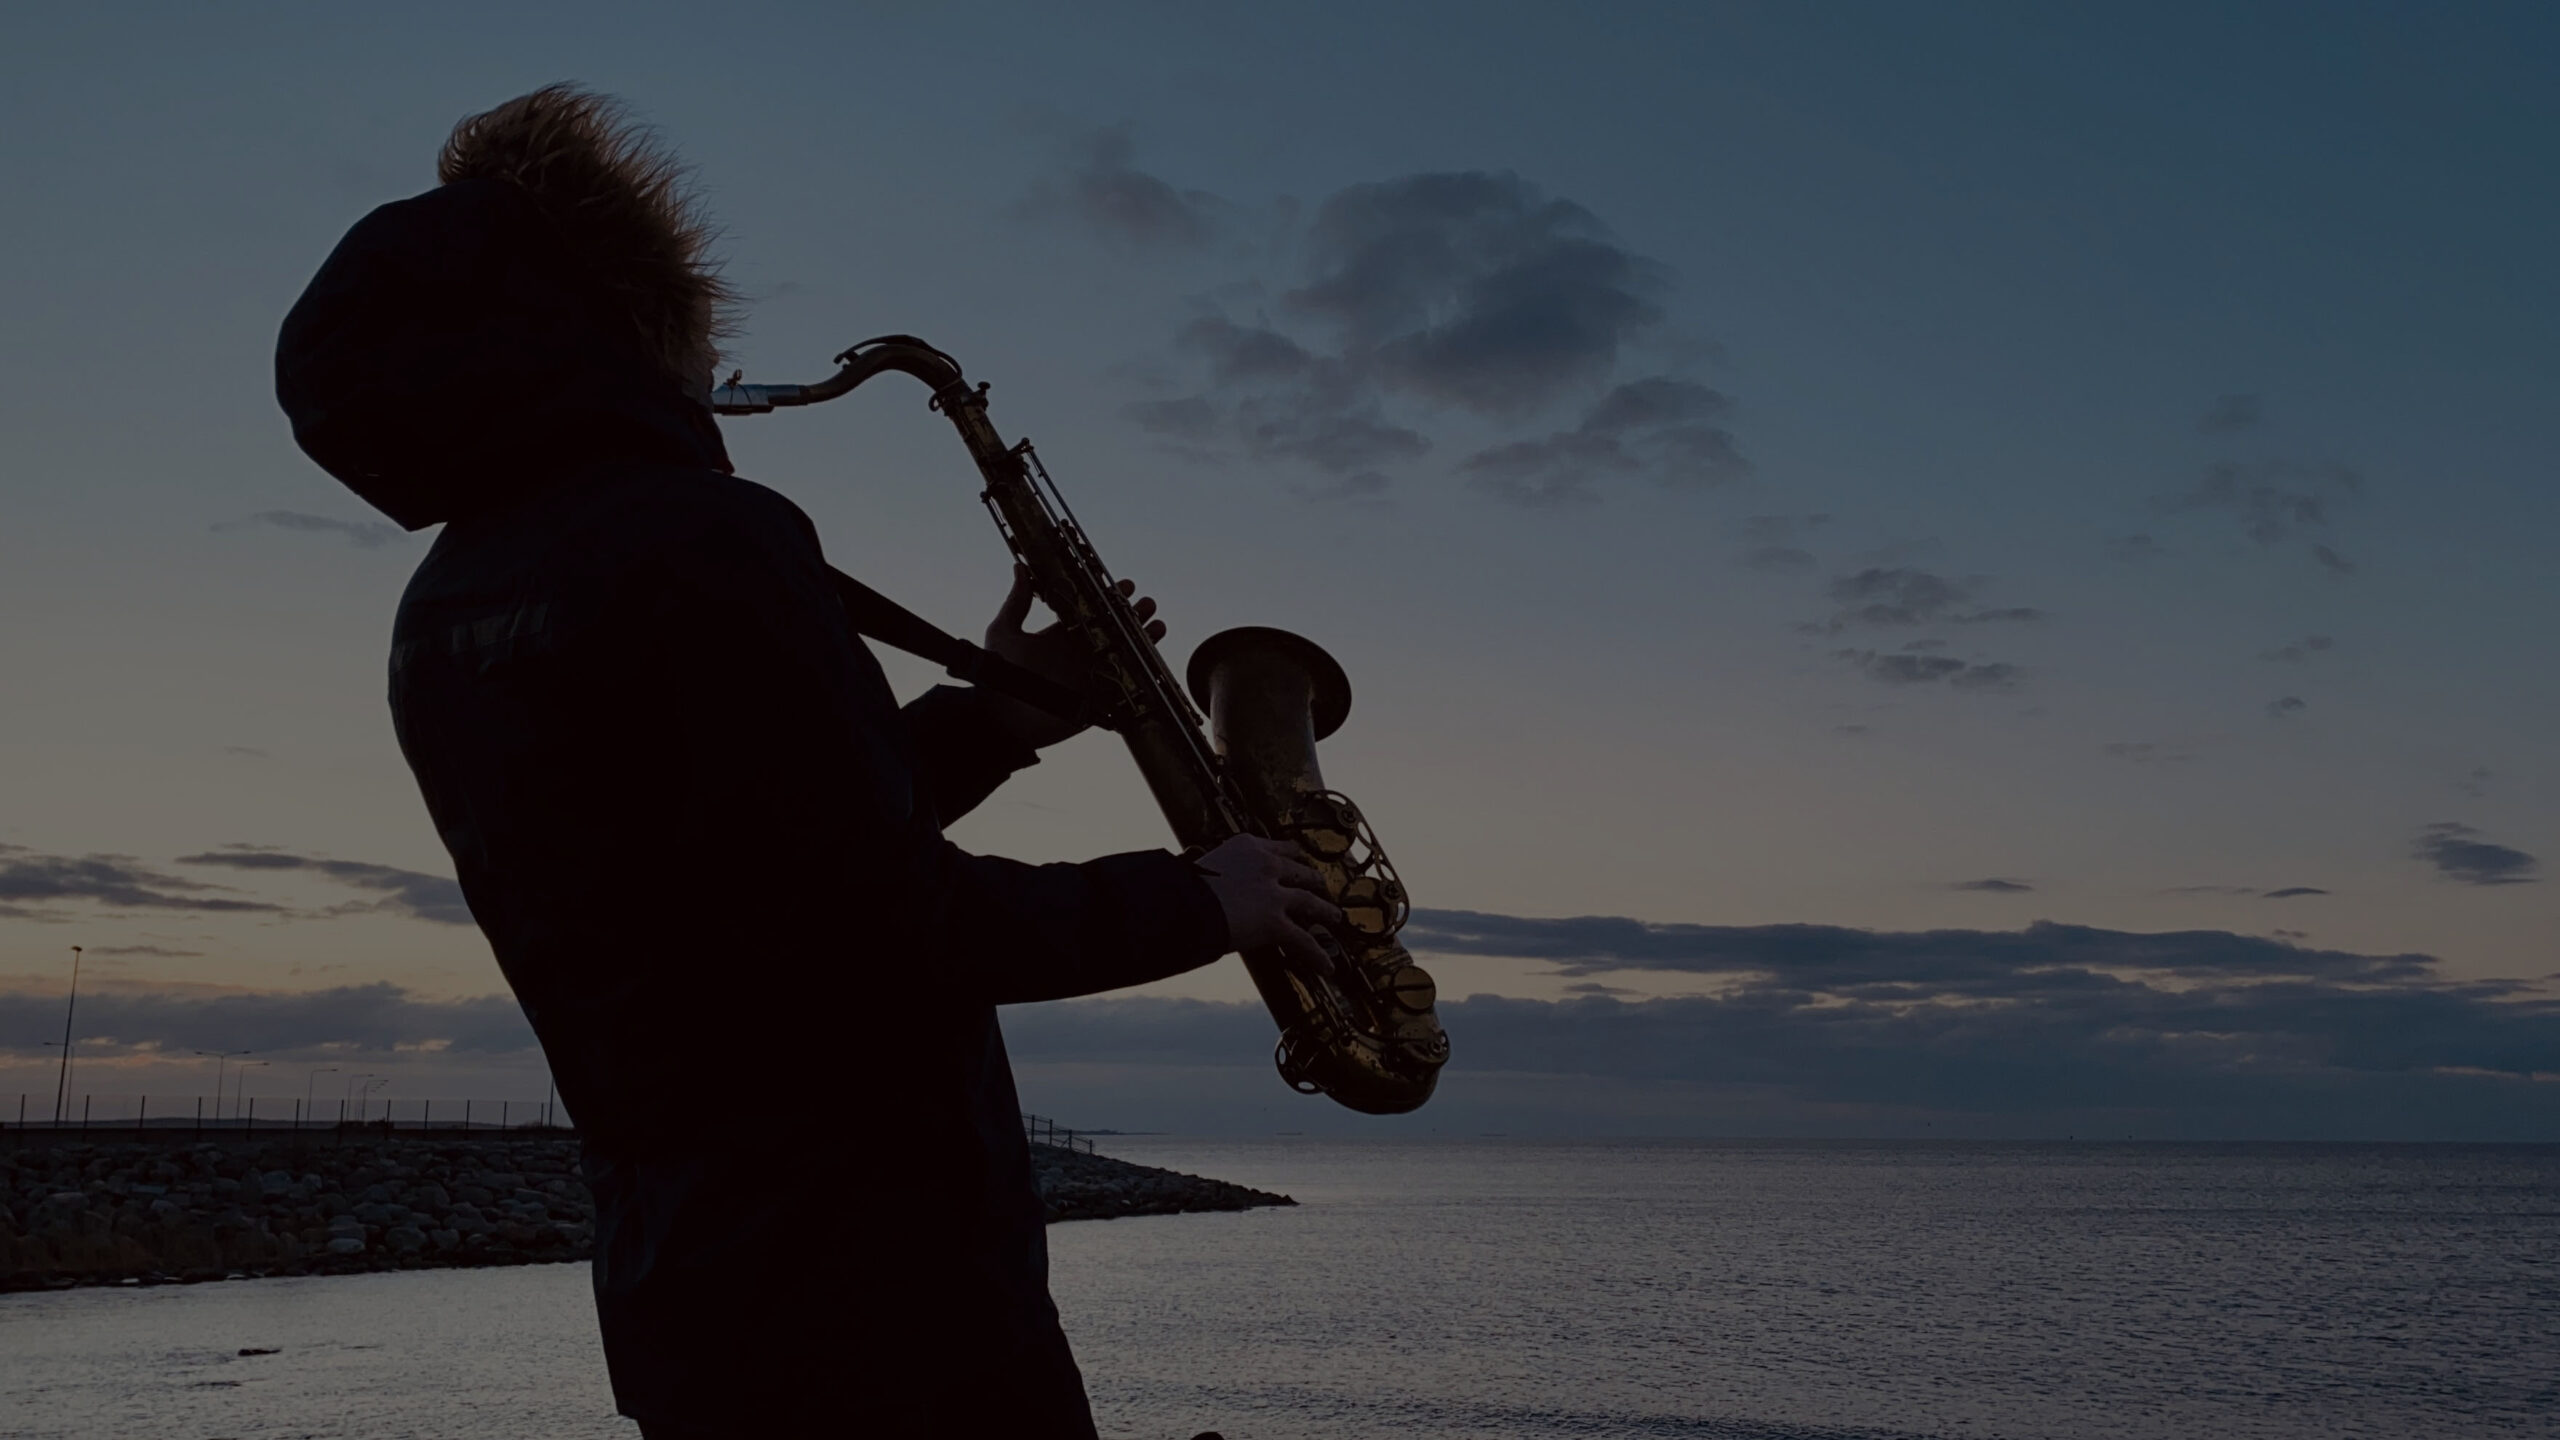 mere ääres saksofonist